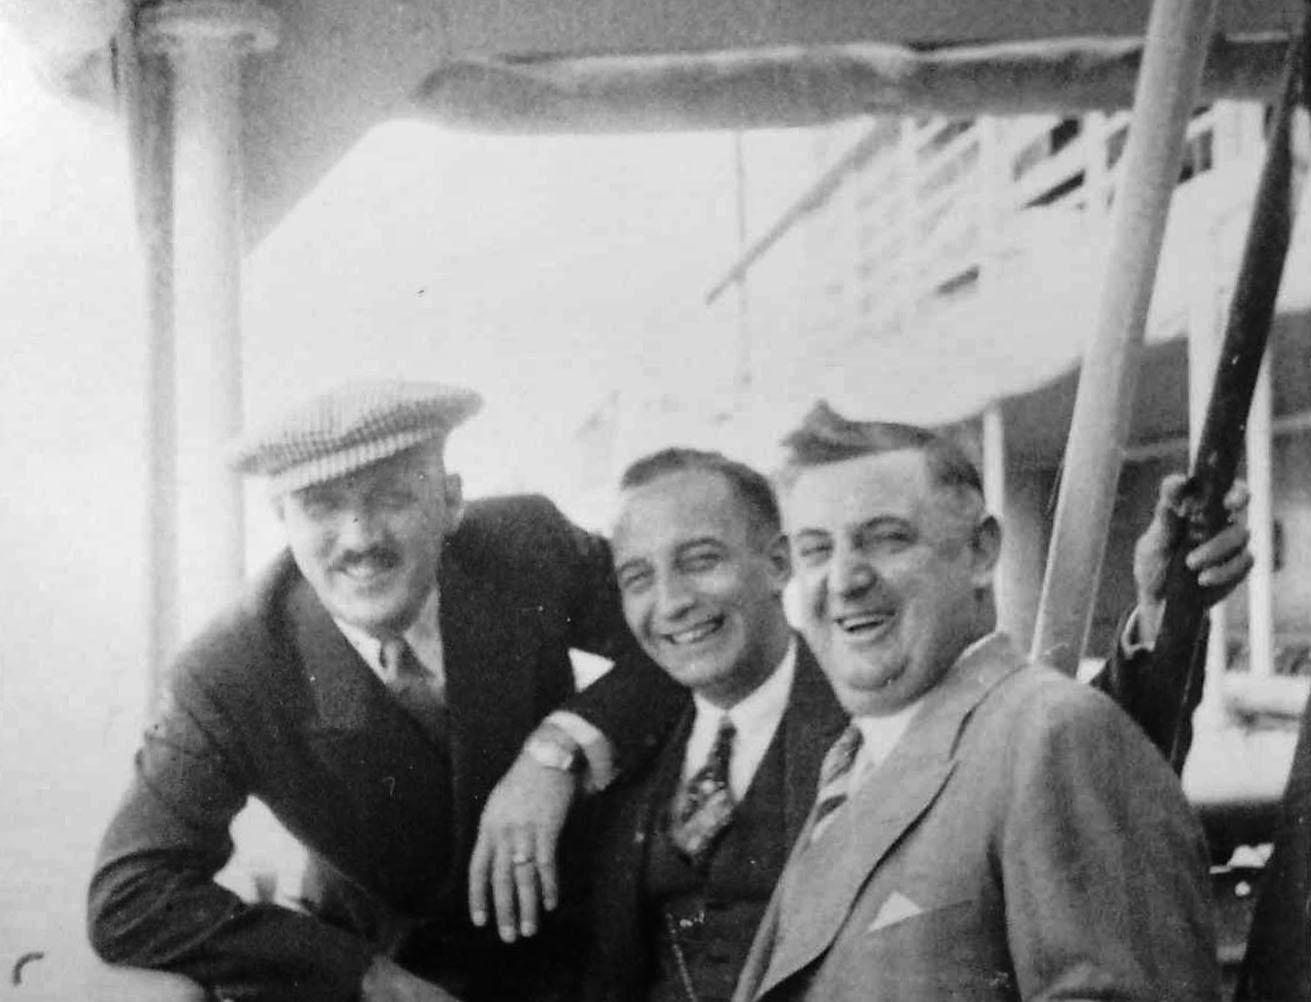 Miles Blaine, Russ Wagner & Ross Hall